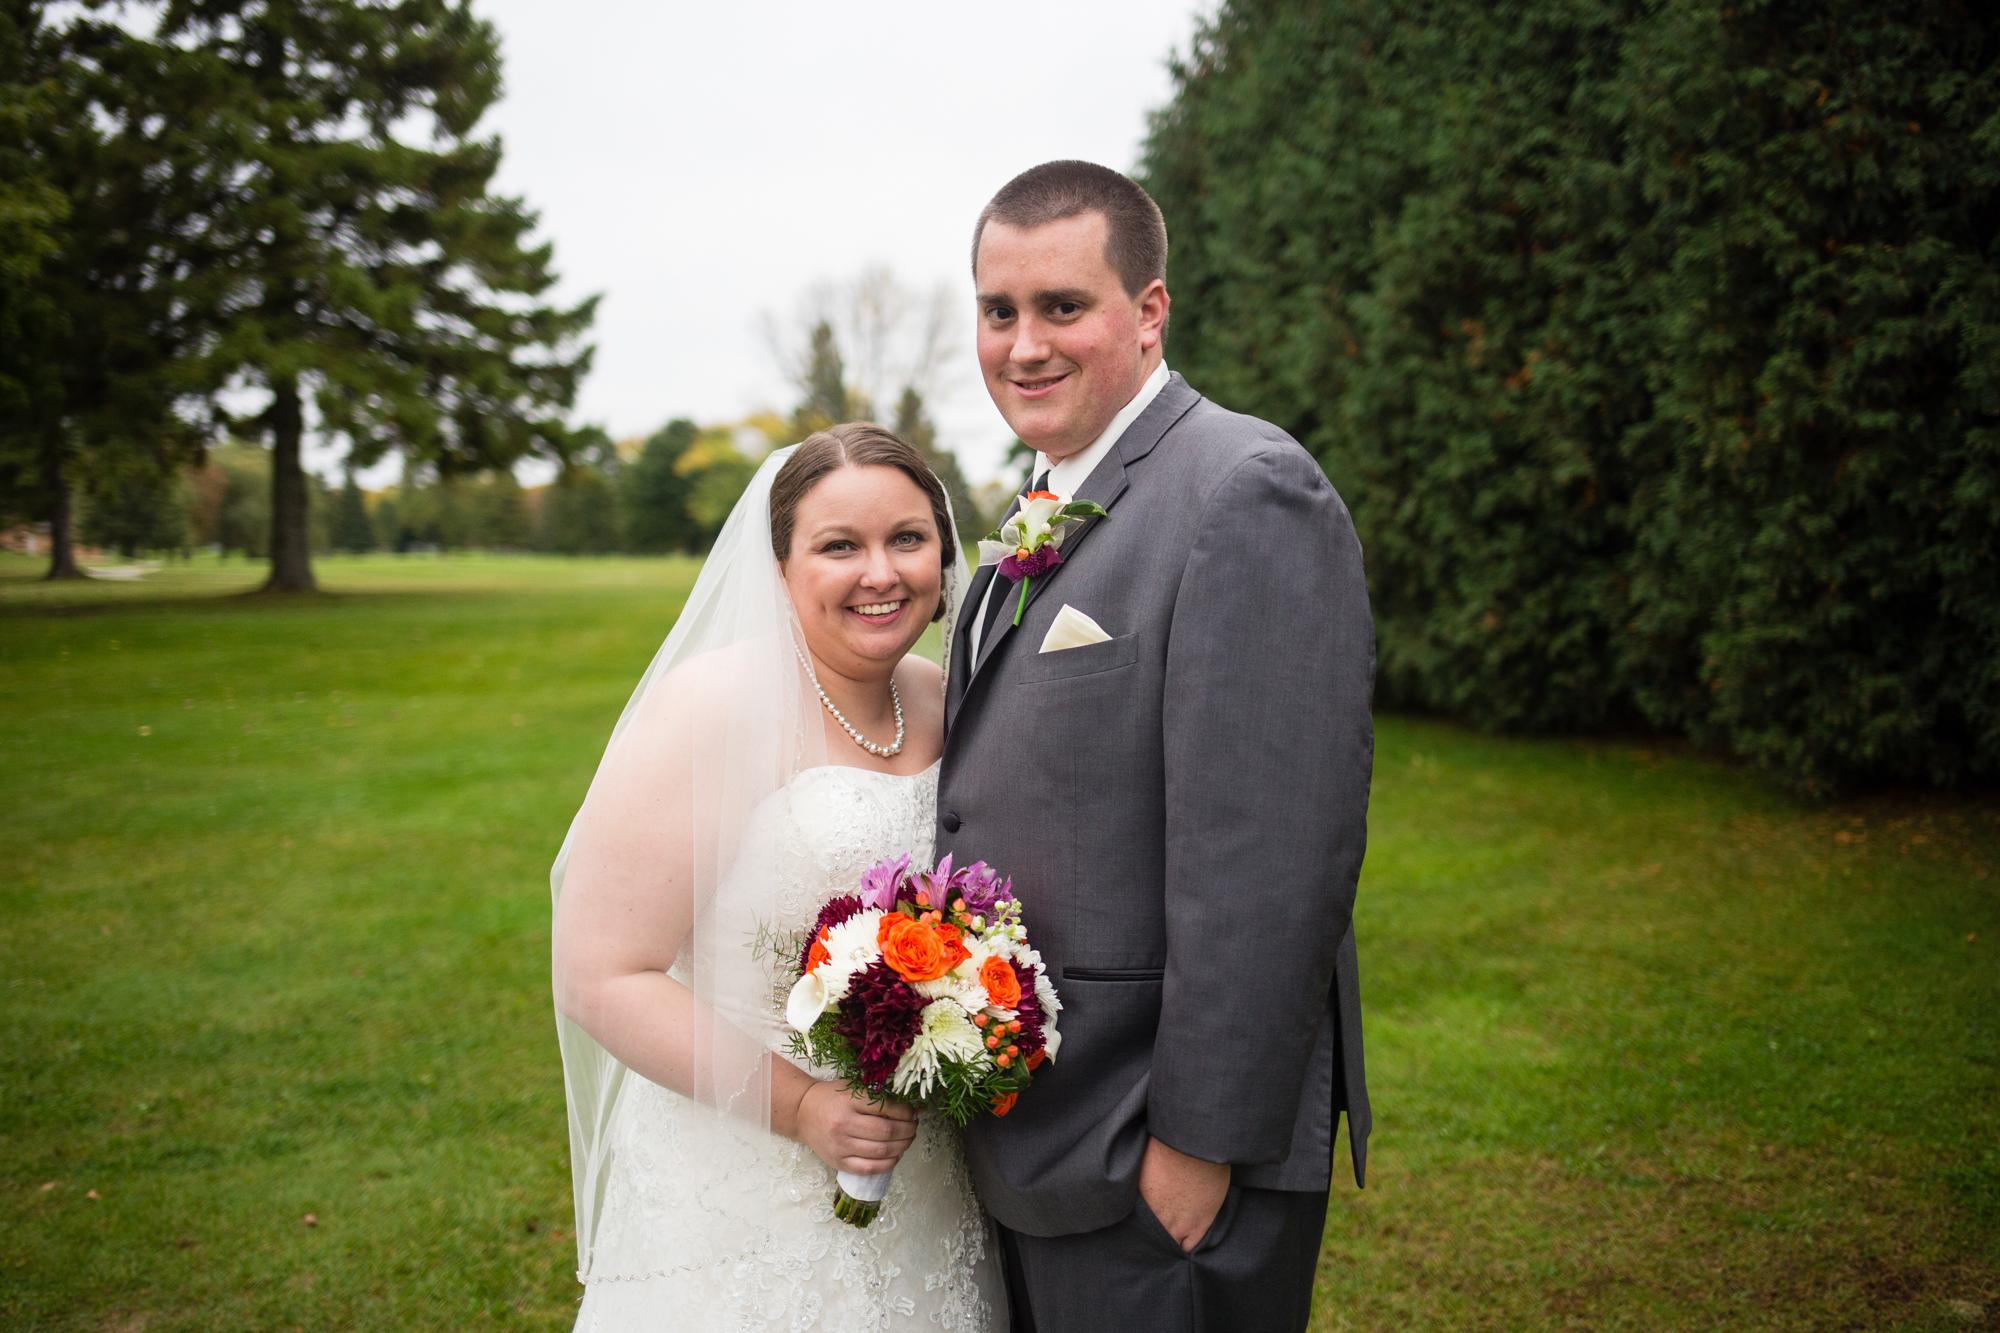 Fox Hills Resort Wedding Green Bay Wisconsin Whit Meza Photography_22.jpg